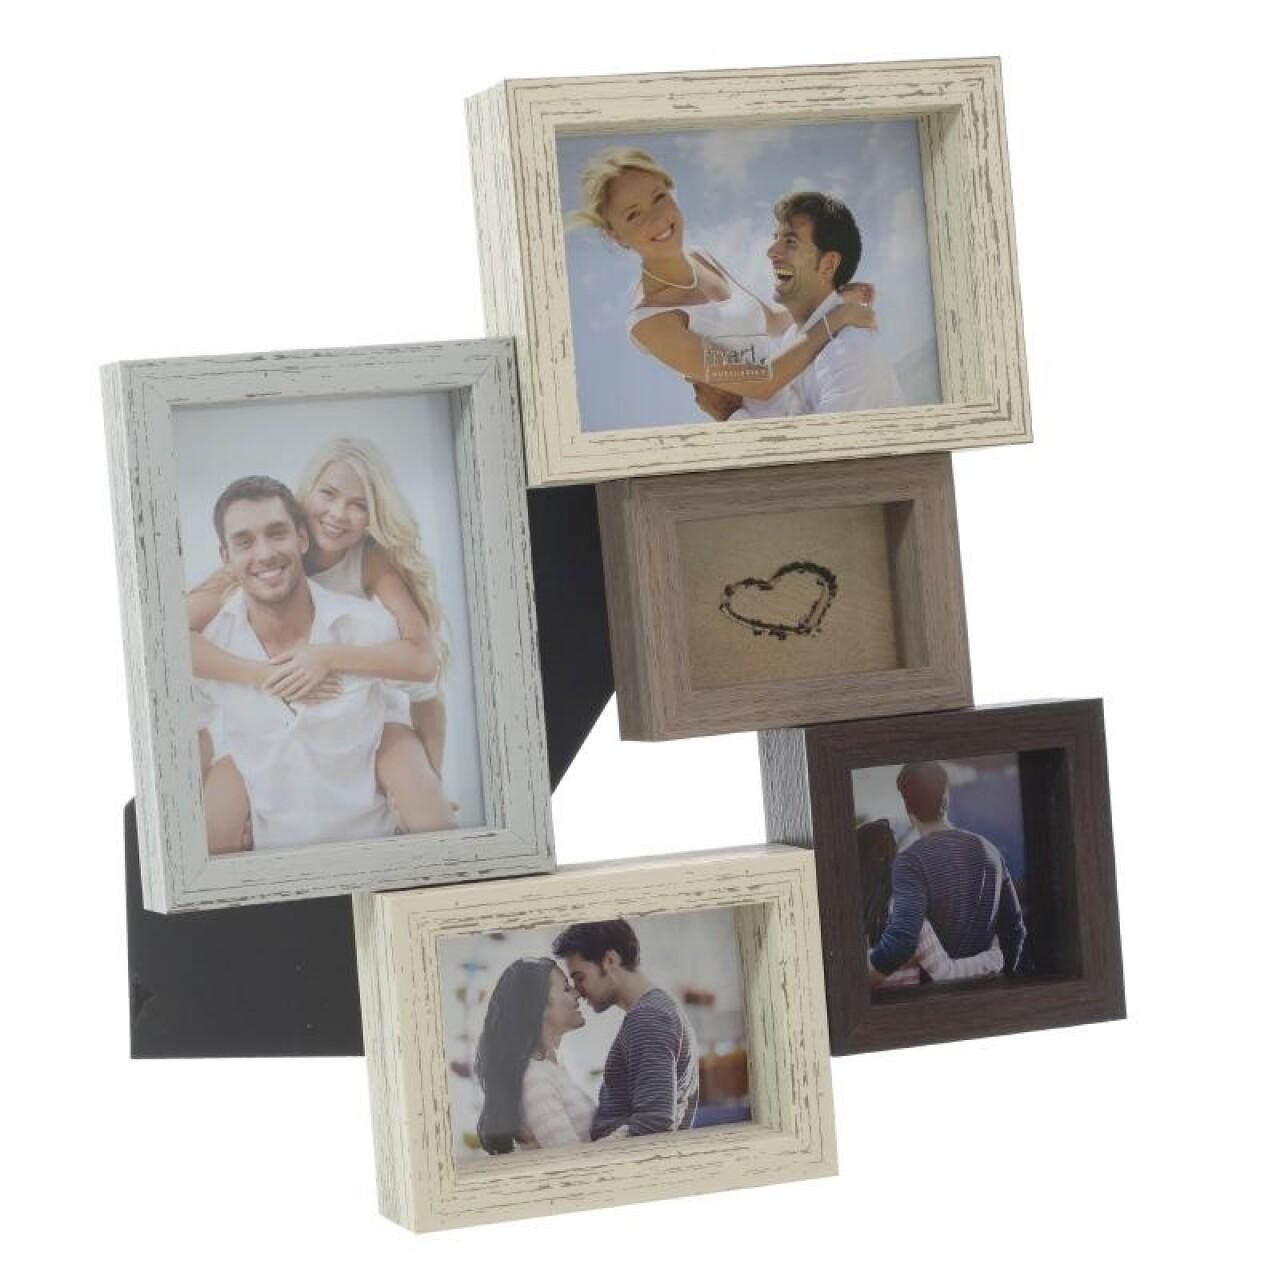 Rama foto Memories, InArt, 5 fotografii, 27 x 31 cm, plastic/sticla, natur